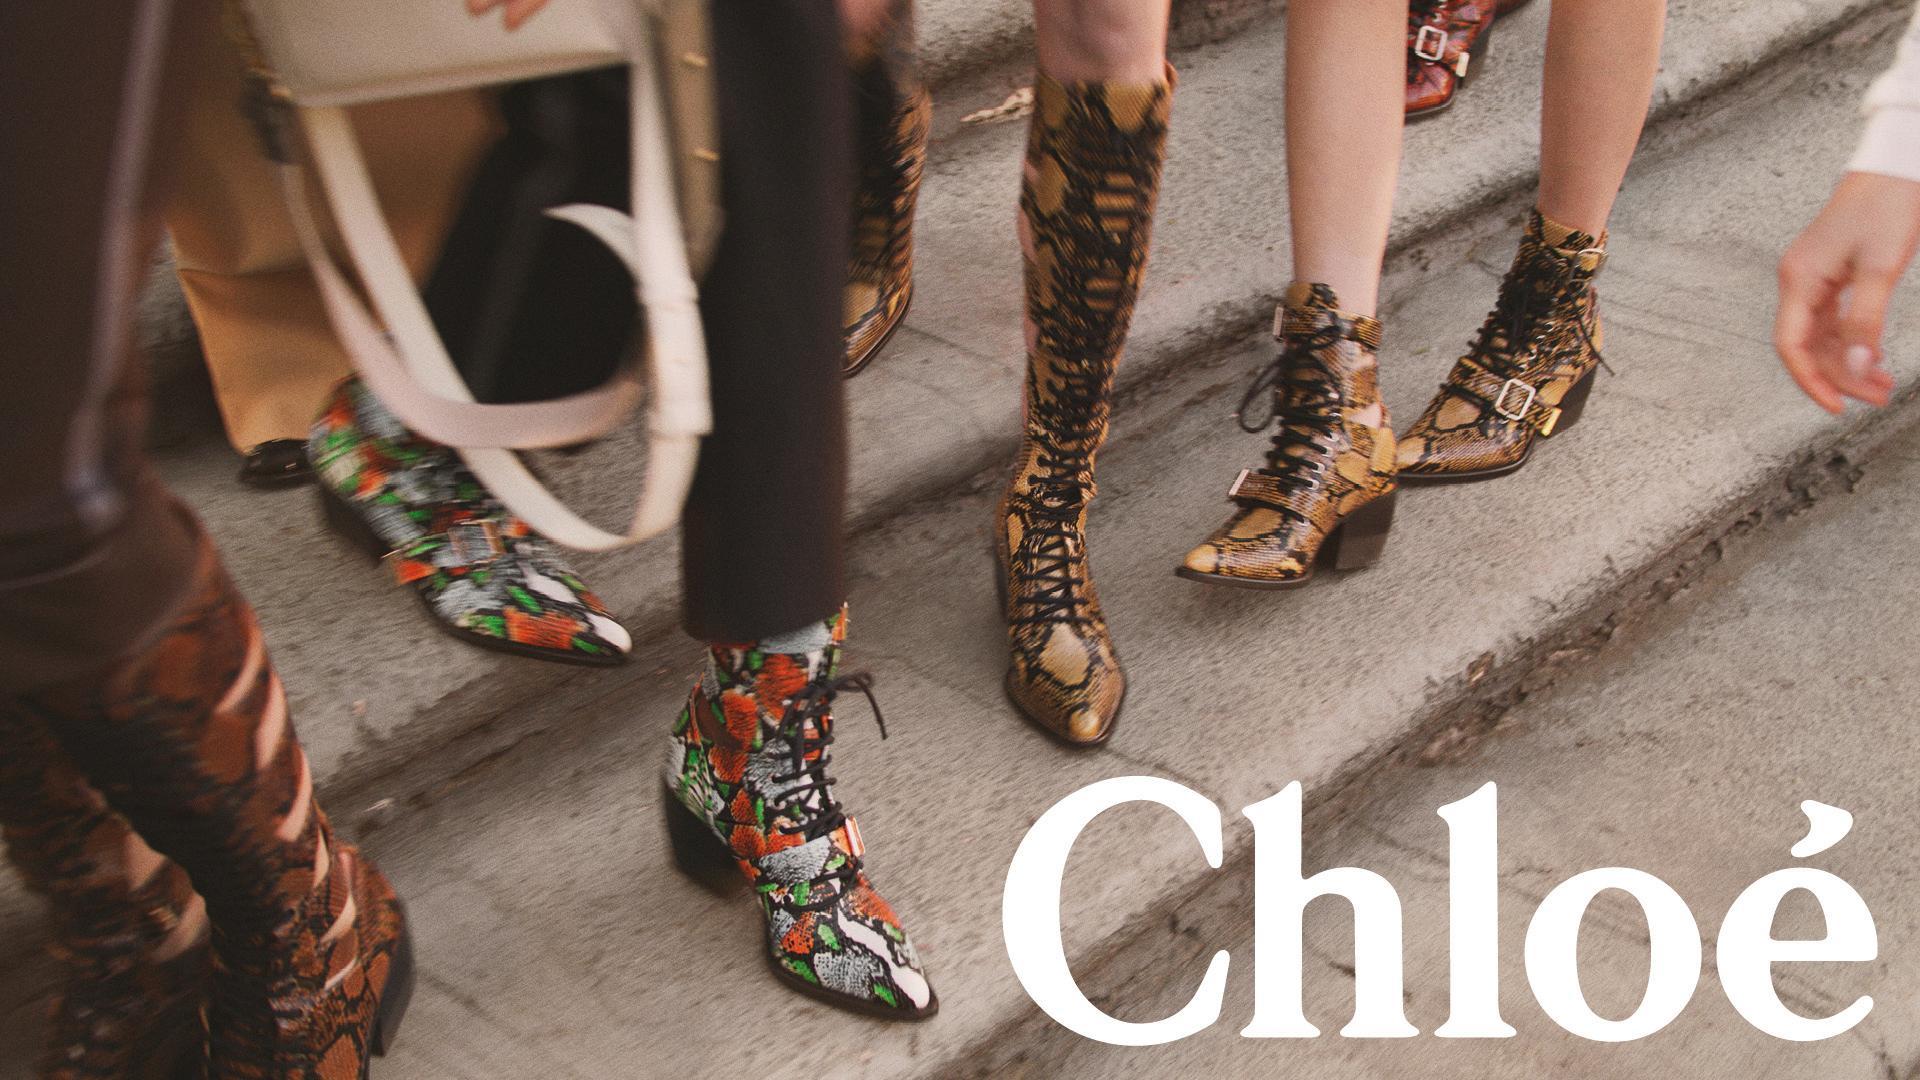 master_chloe_ss18_fashion4_1920x1080